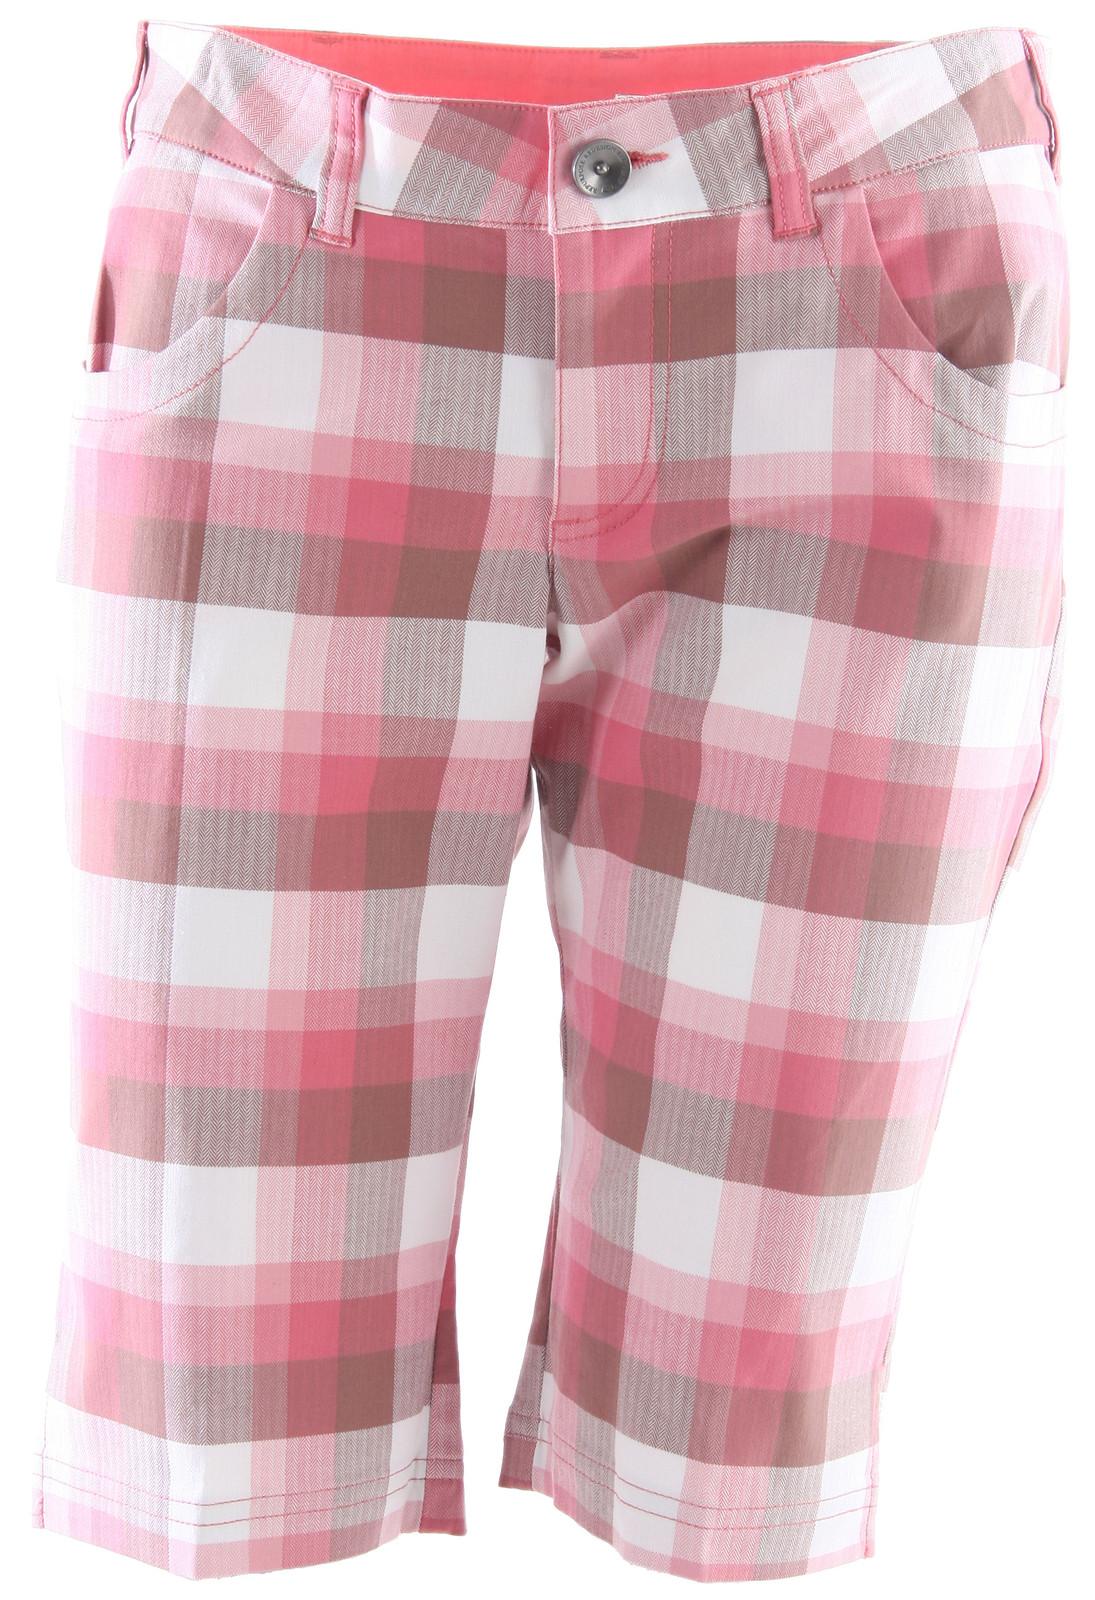 Oakley Walk Shorts Coral Pink  okly-walkshort-shorts-wmns-coralpink-11.jpg